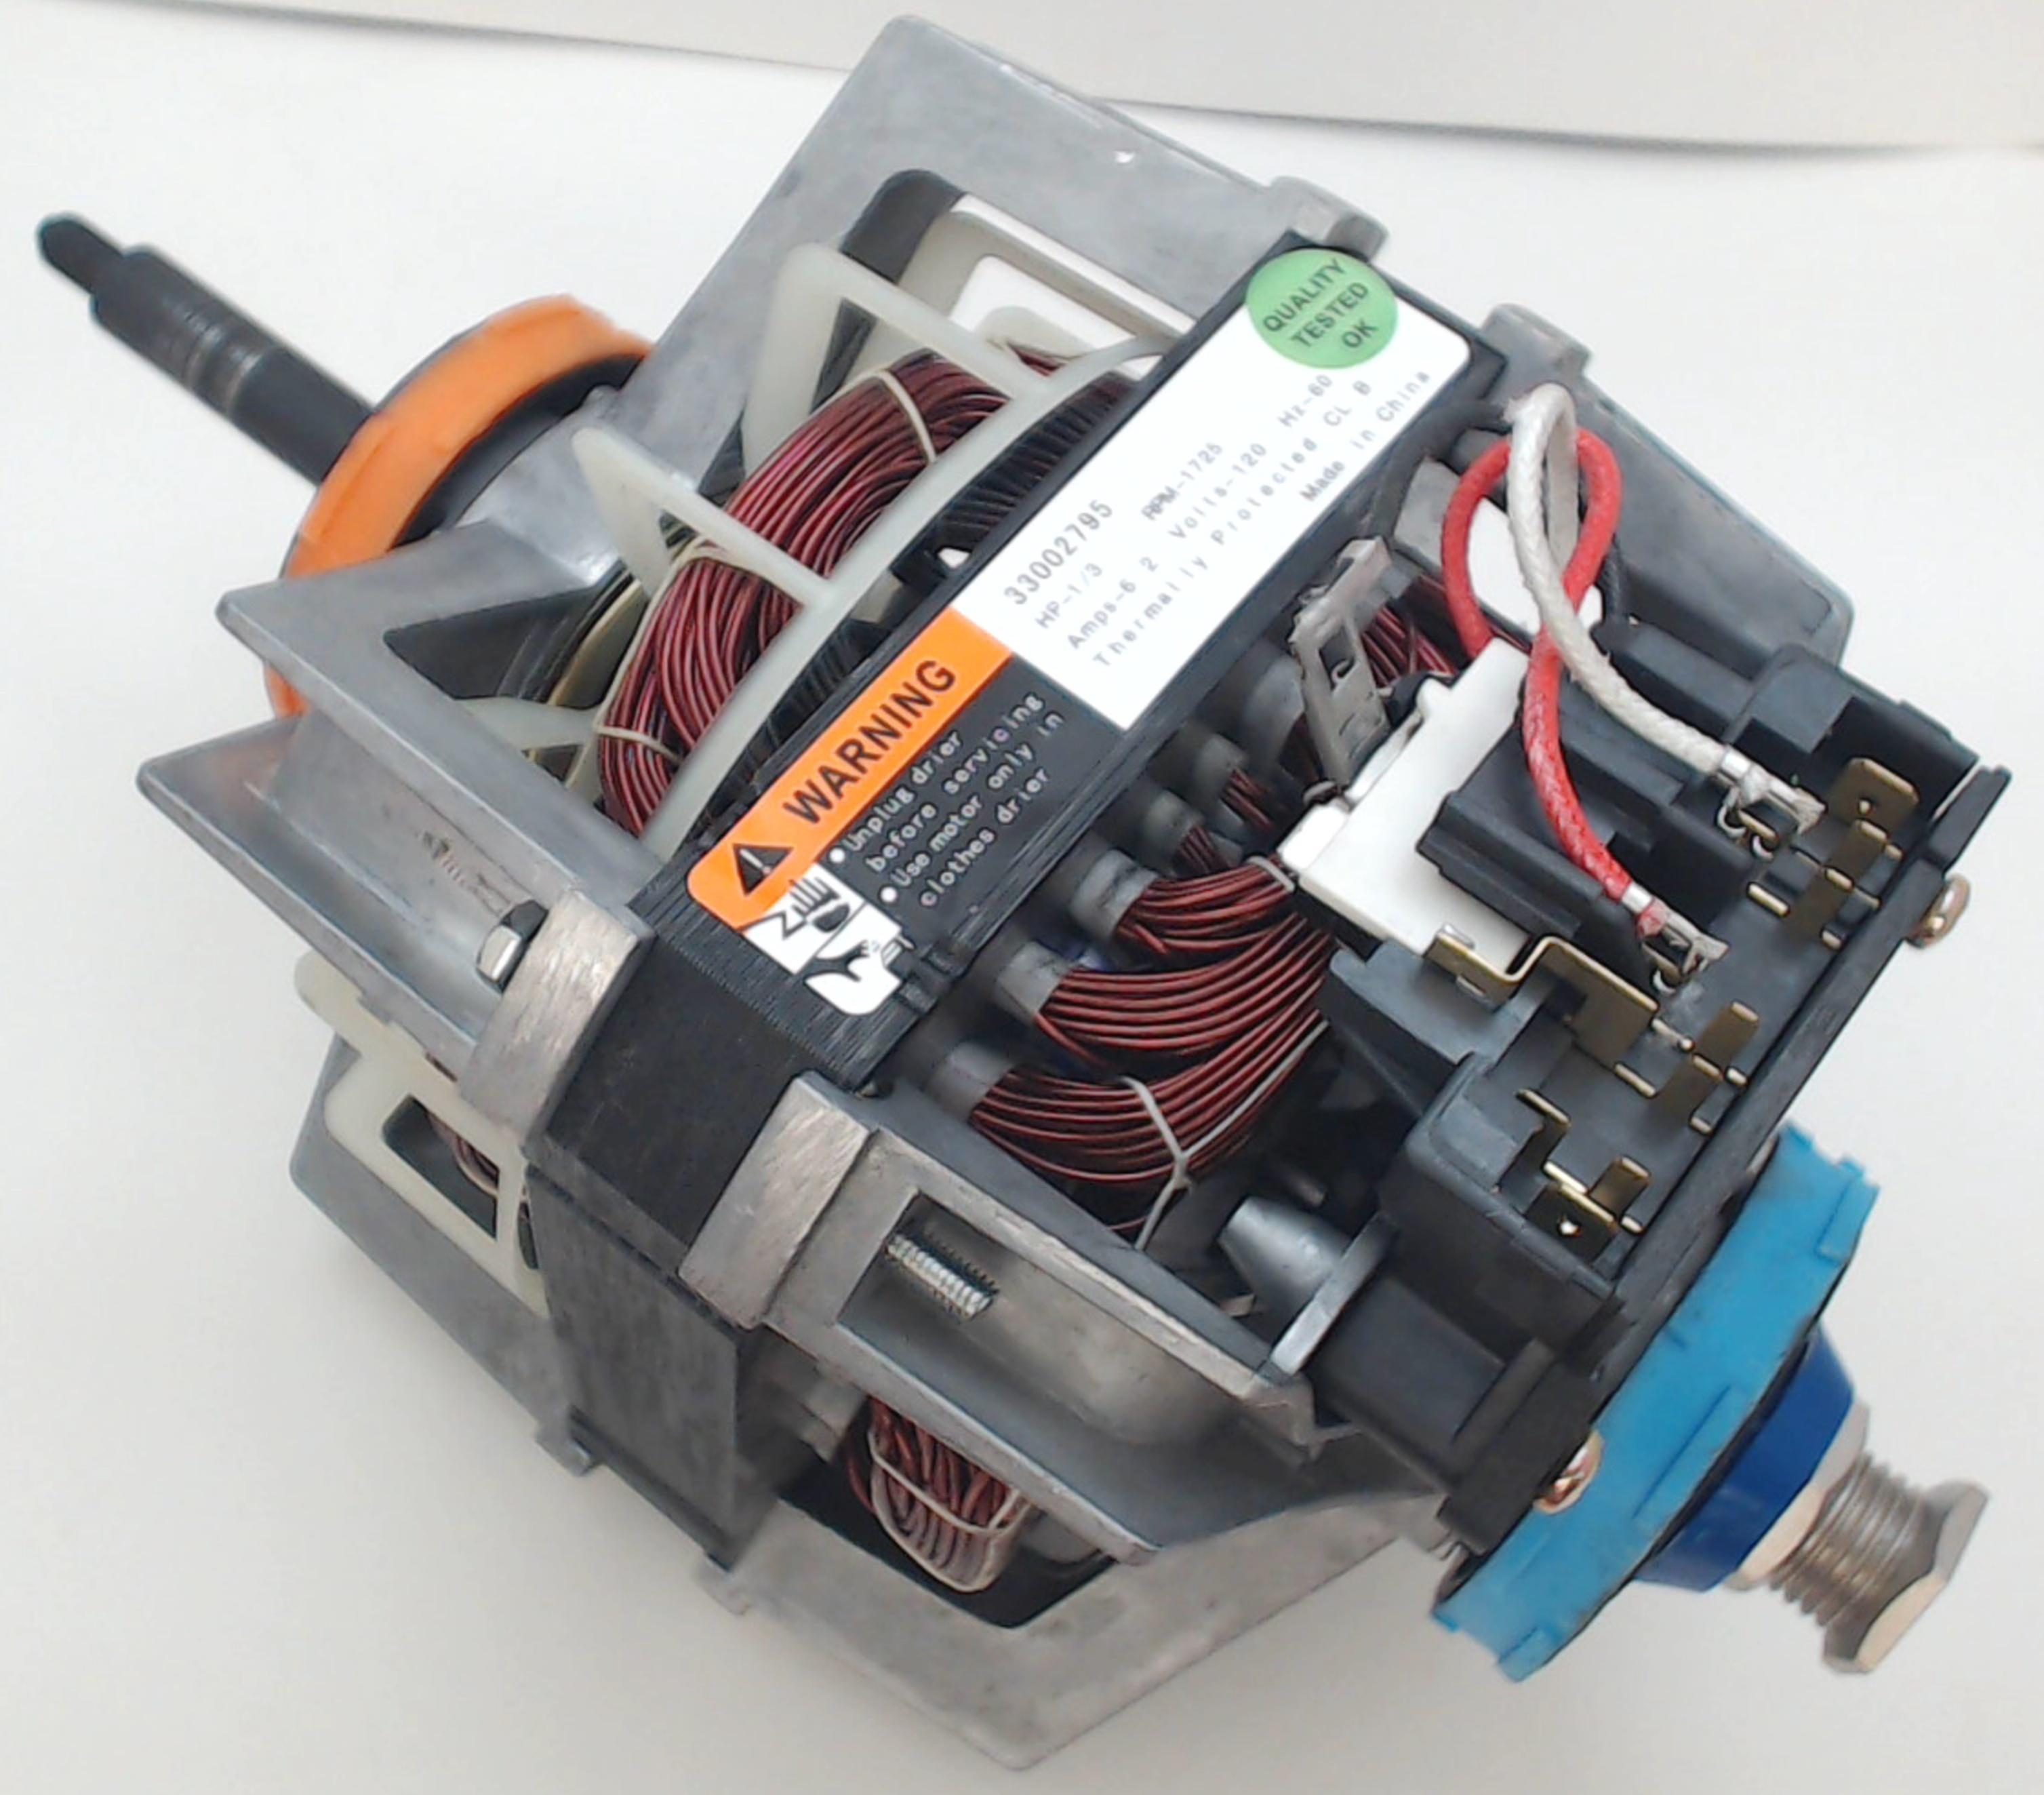 33002795 Dryer Motor Fits Roper Kenmore Whirlpool 793713641140 Ebay Maytag Electric Gas Tumbler Parts Model Mdg9316aww